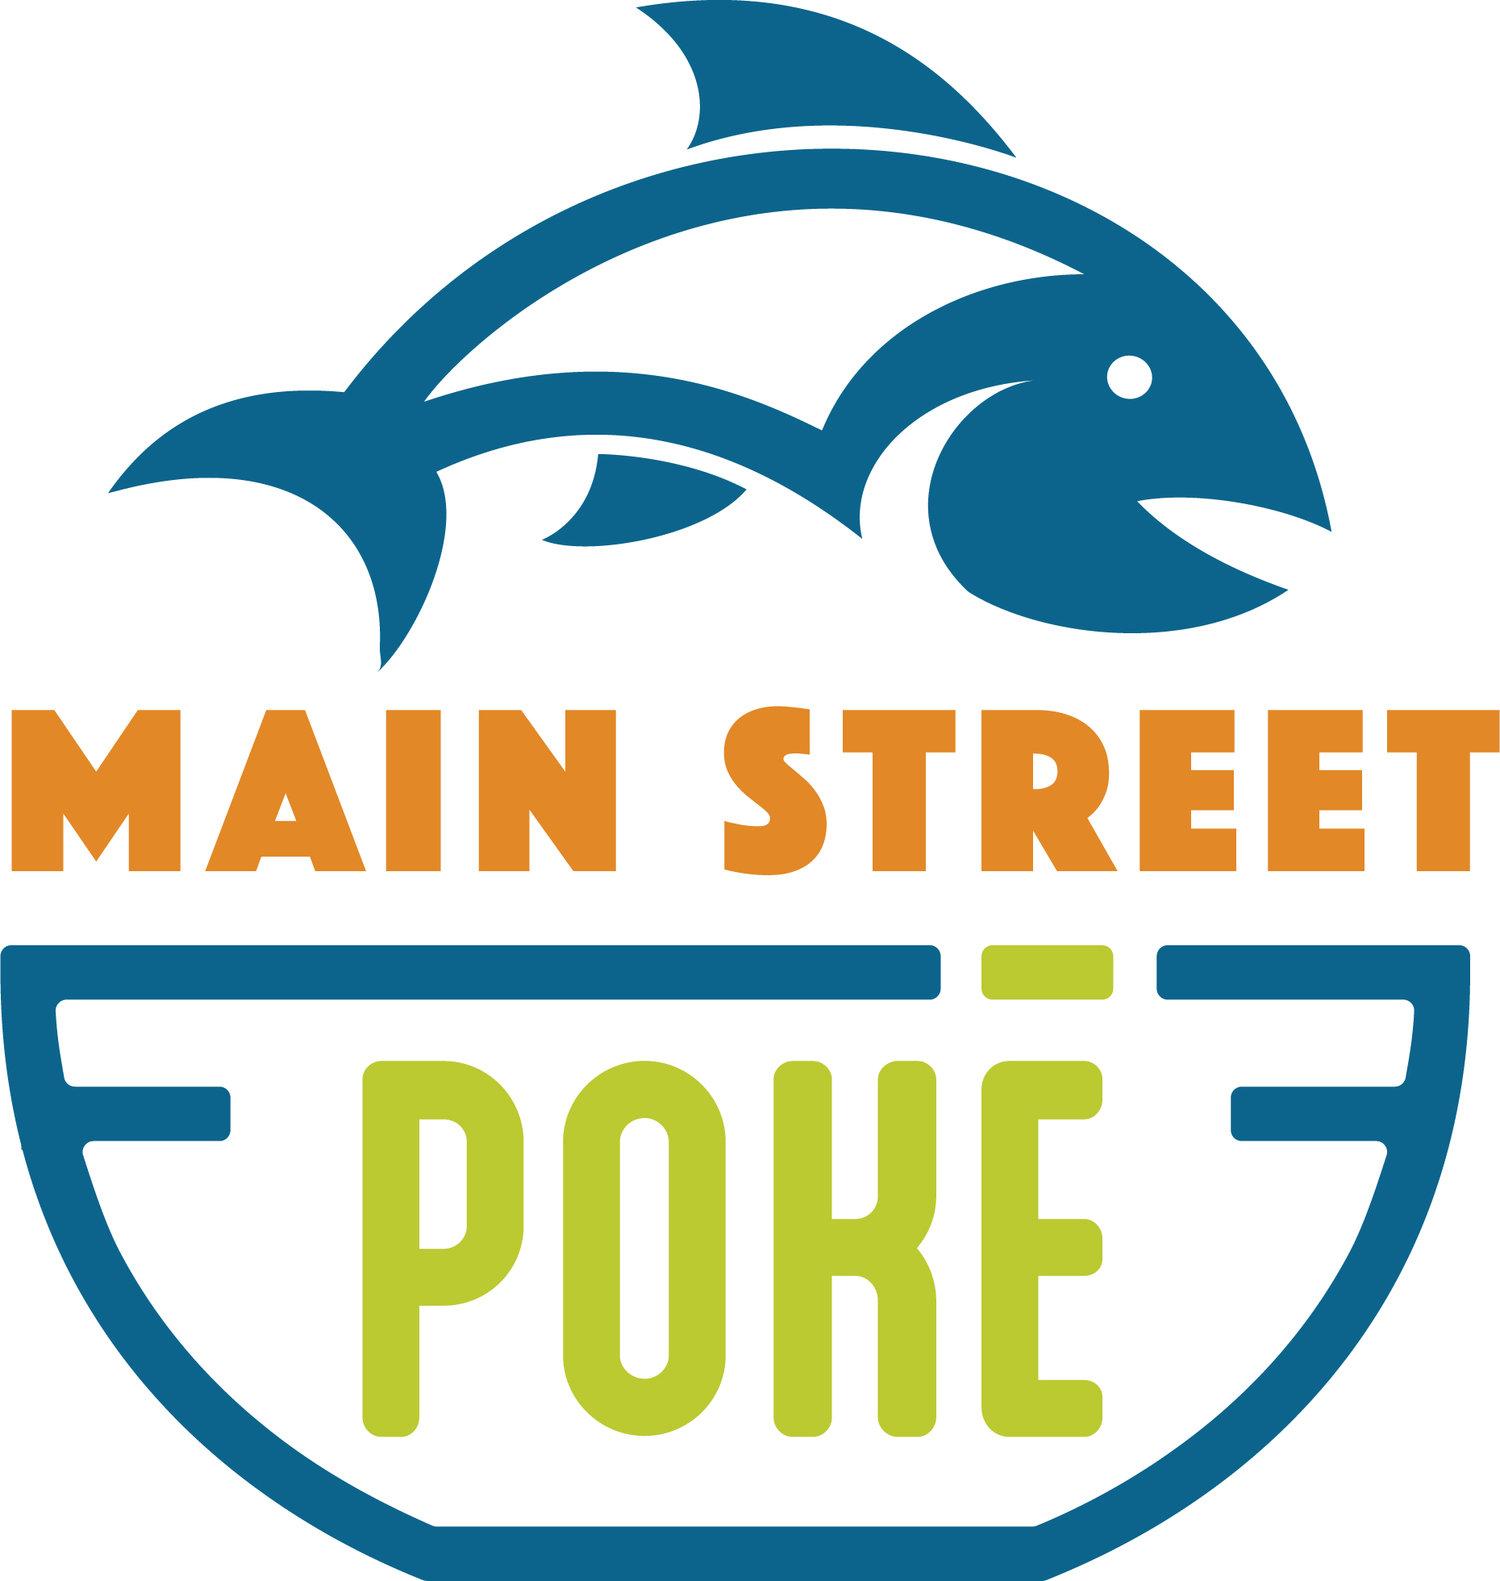 Main Street Poke - W Main St